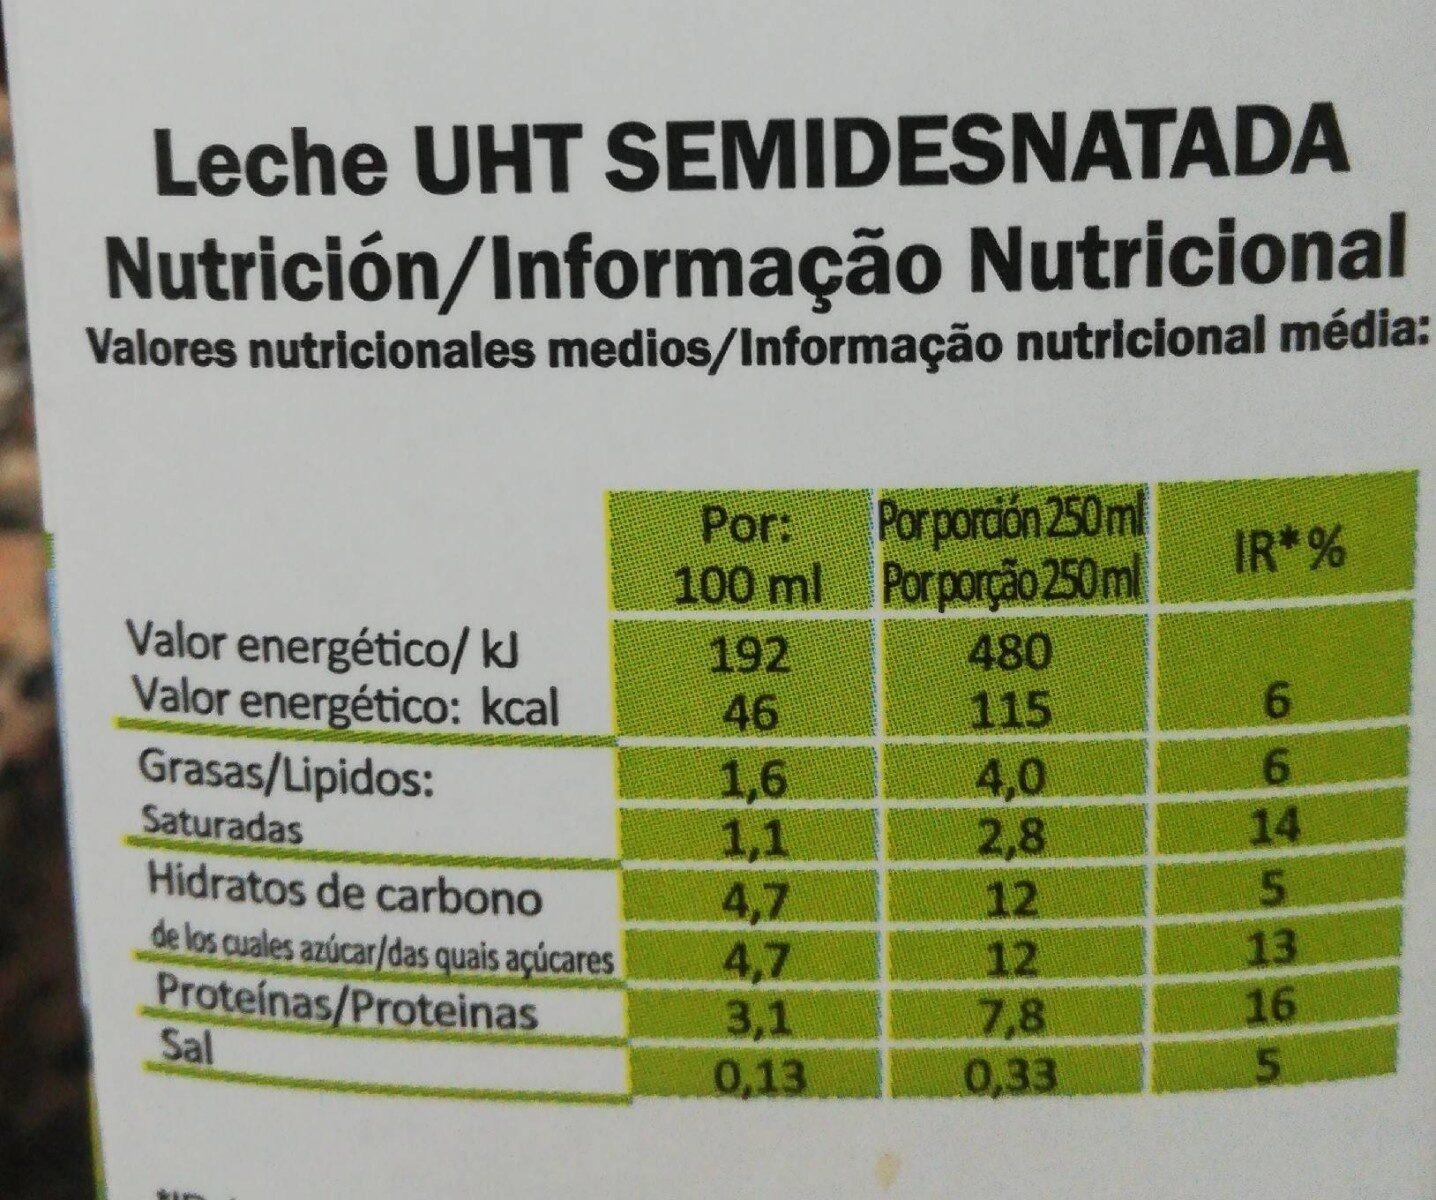 Leche Semidesnatada - Nutrition facts